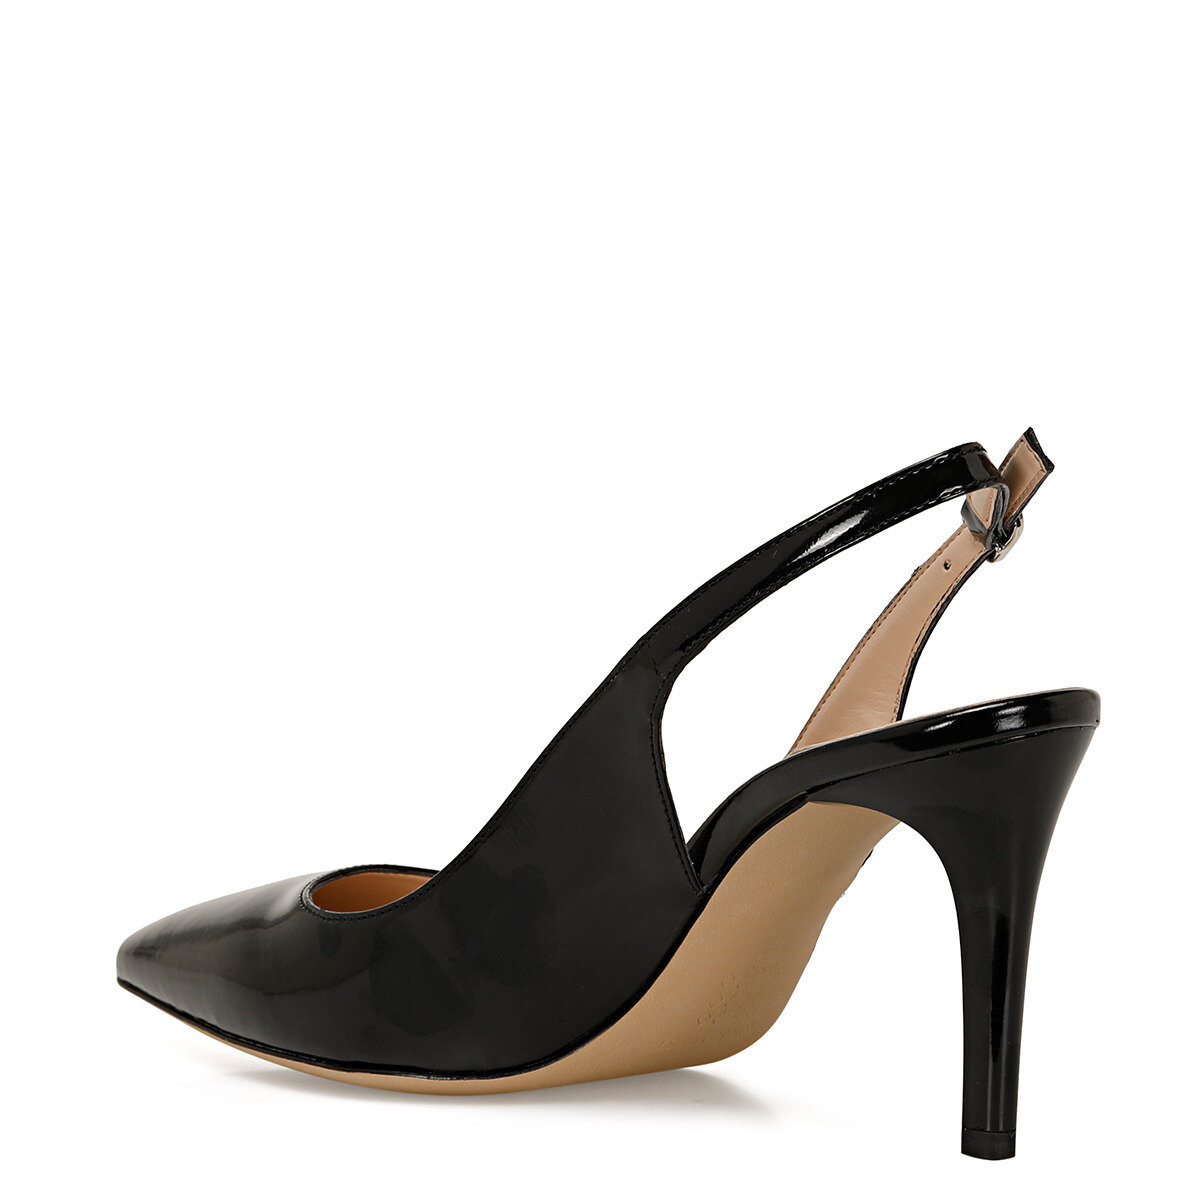 SOLARA Siyah Kadın Stiletto